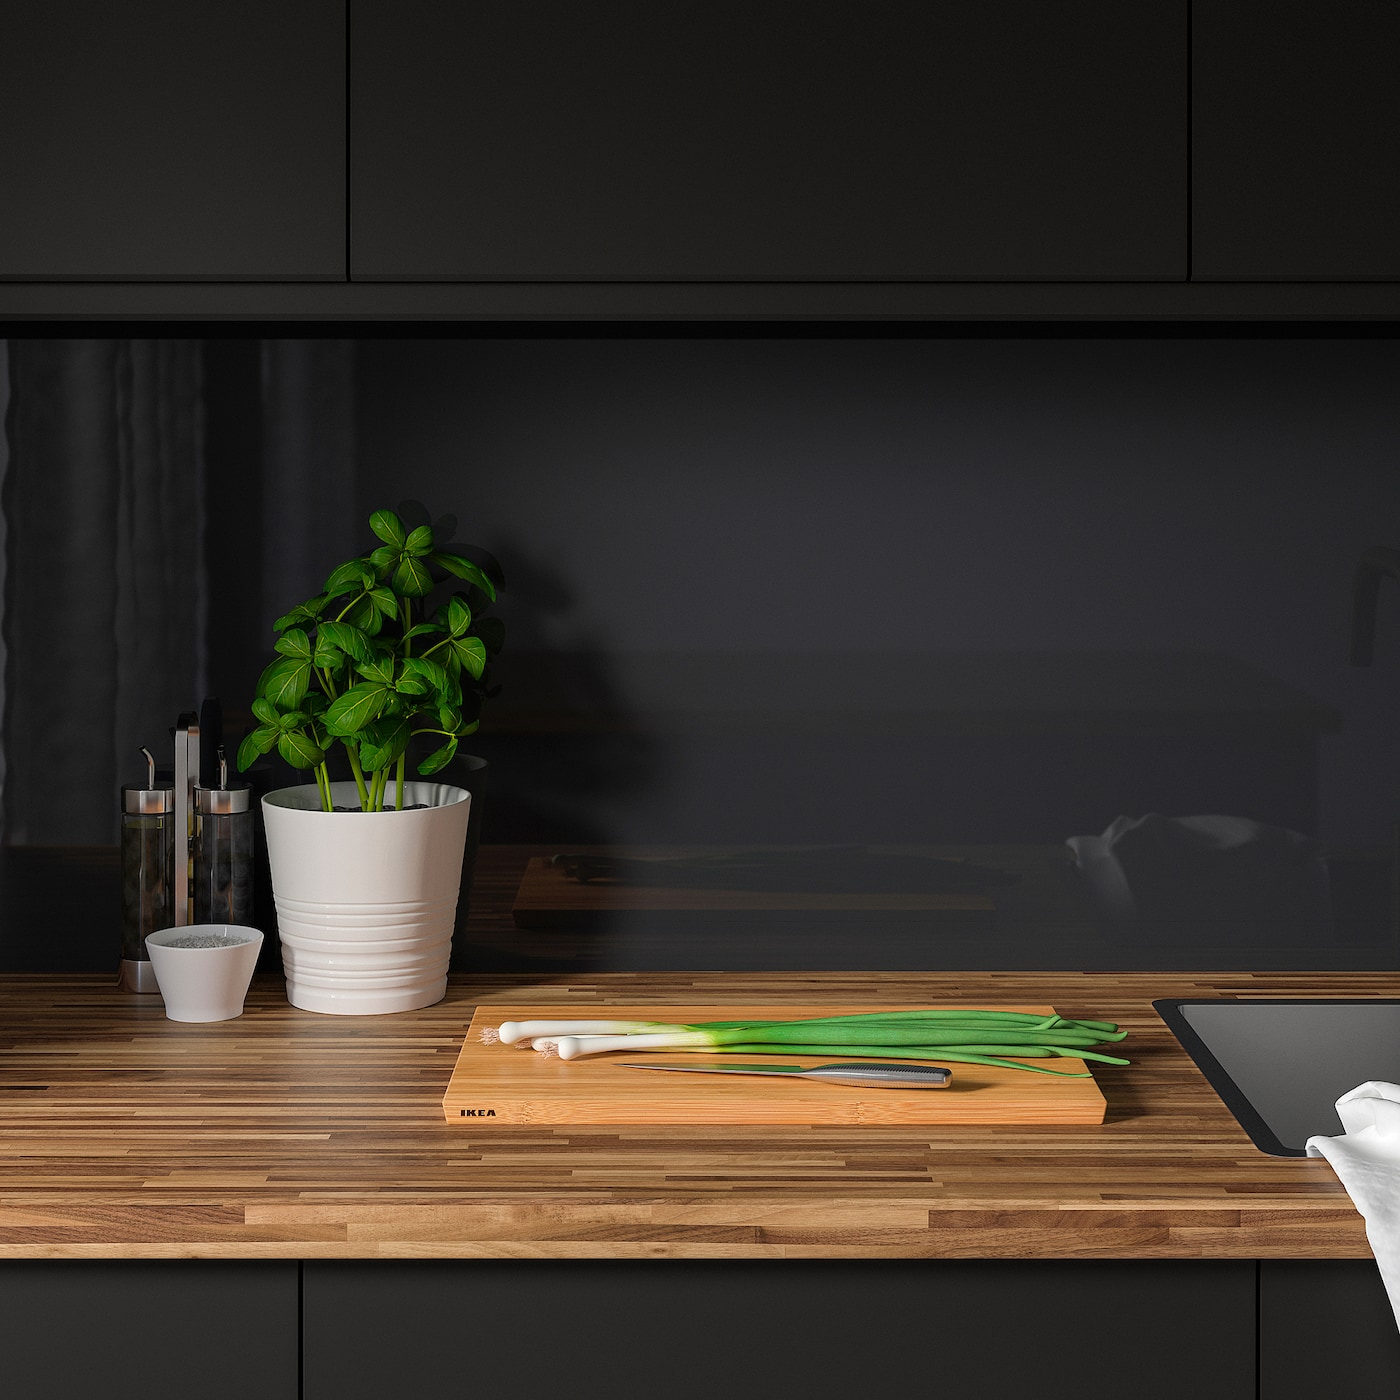 PINNARP 핀나르프 조리대, 호두나무/무늬목, 186x3.8 cm